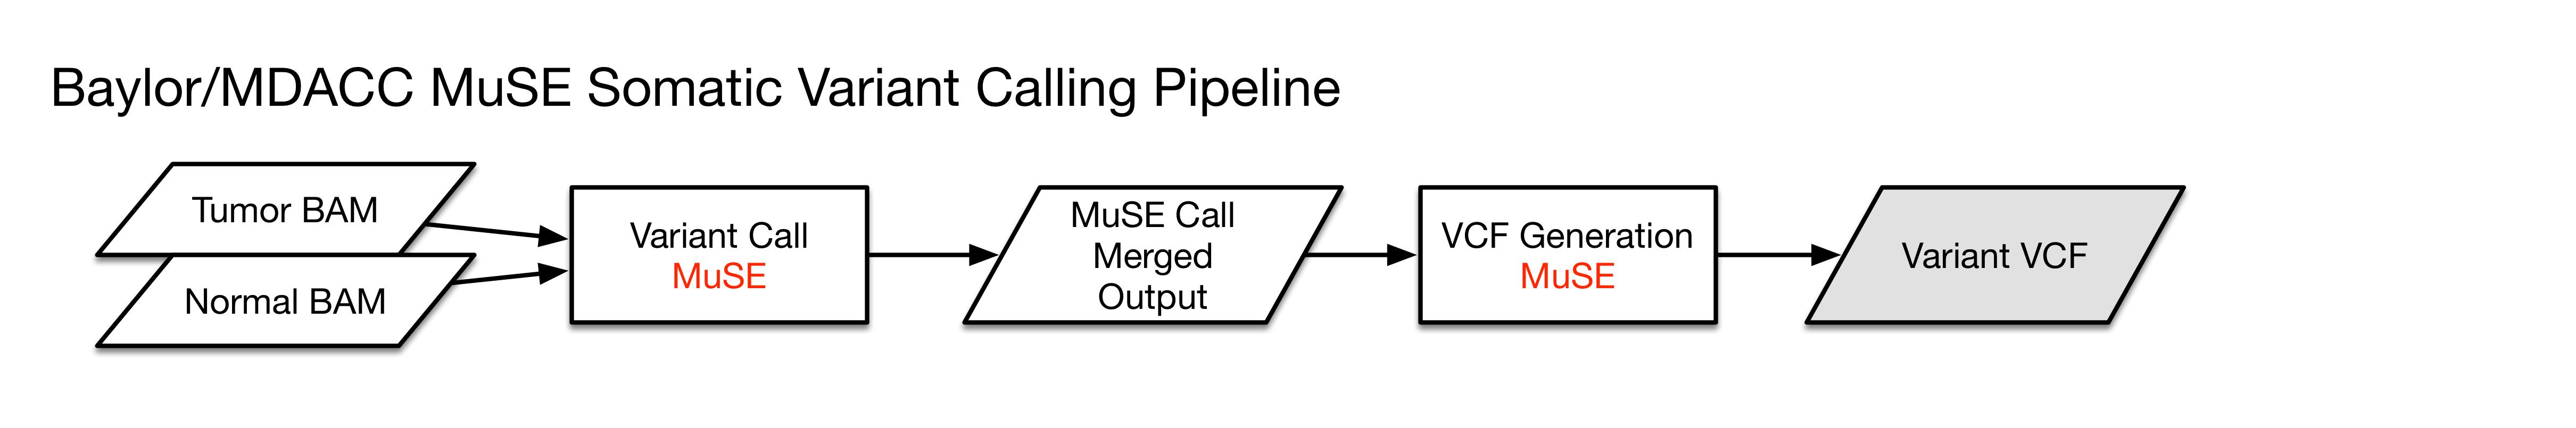 Bioinformatics Pipeline: DNA-Seq Analysis - GDC Docs